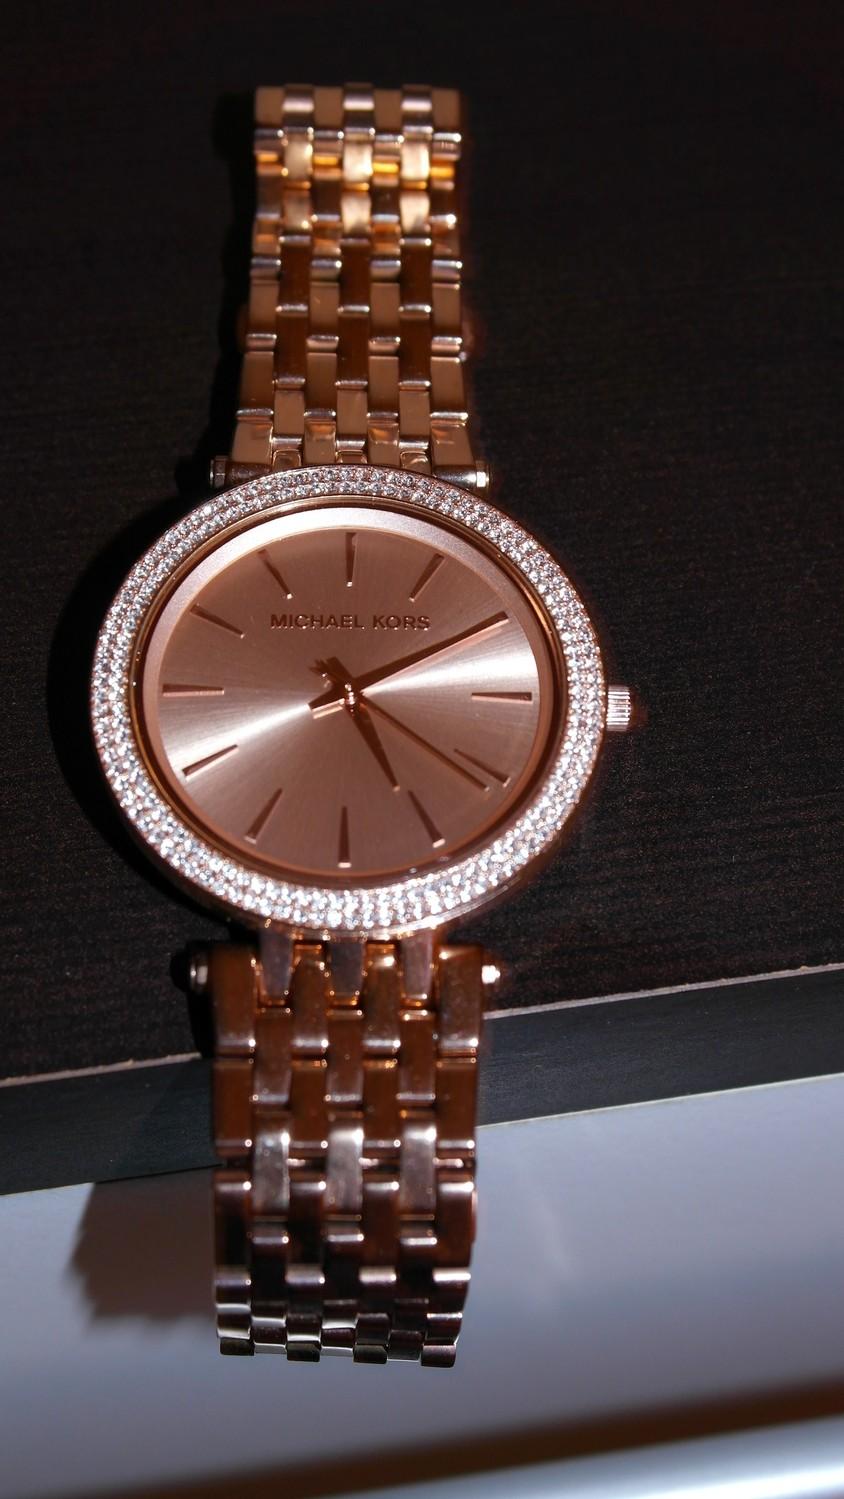 Darci MK-3192 | Michael Kors beliebteste Uhr | hot-port.de | 30+ Style Blog